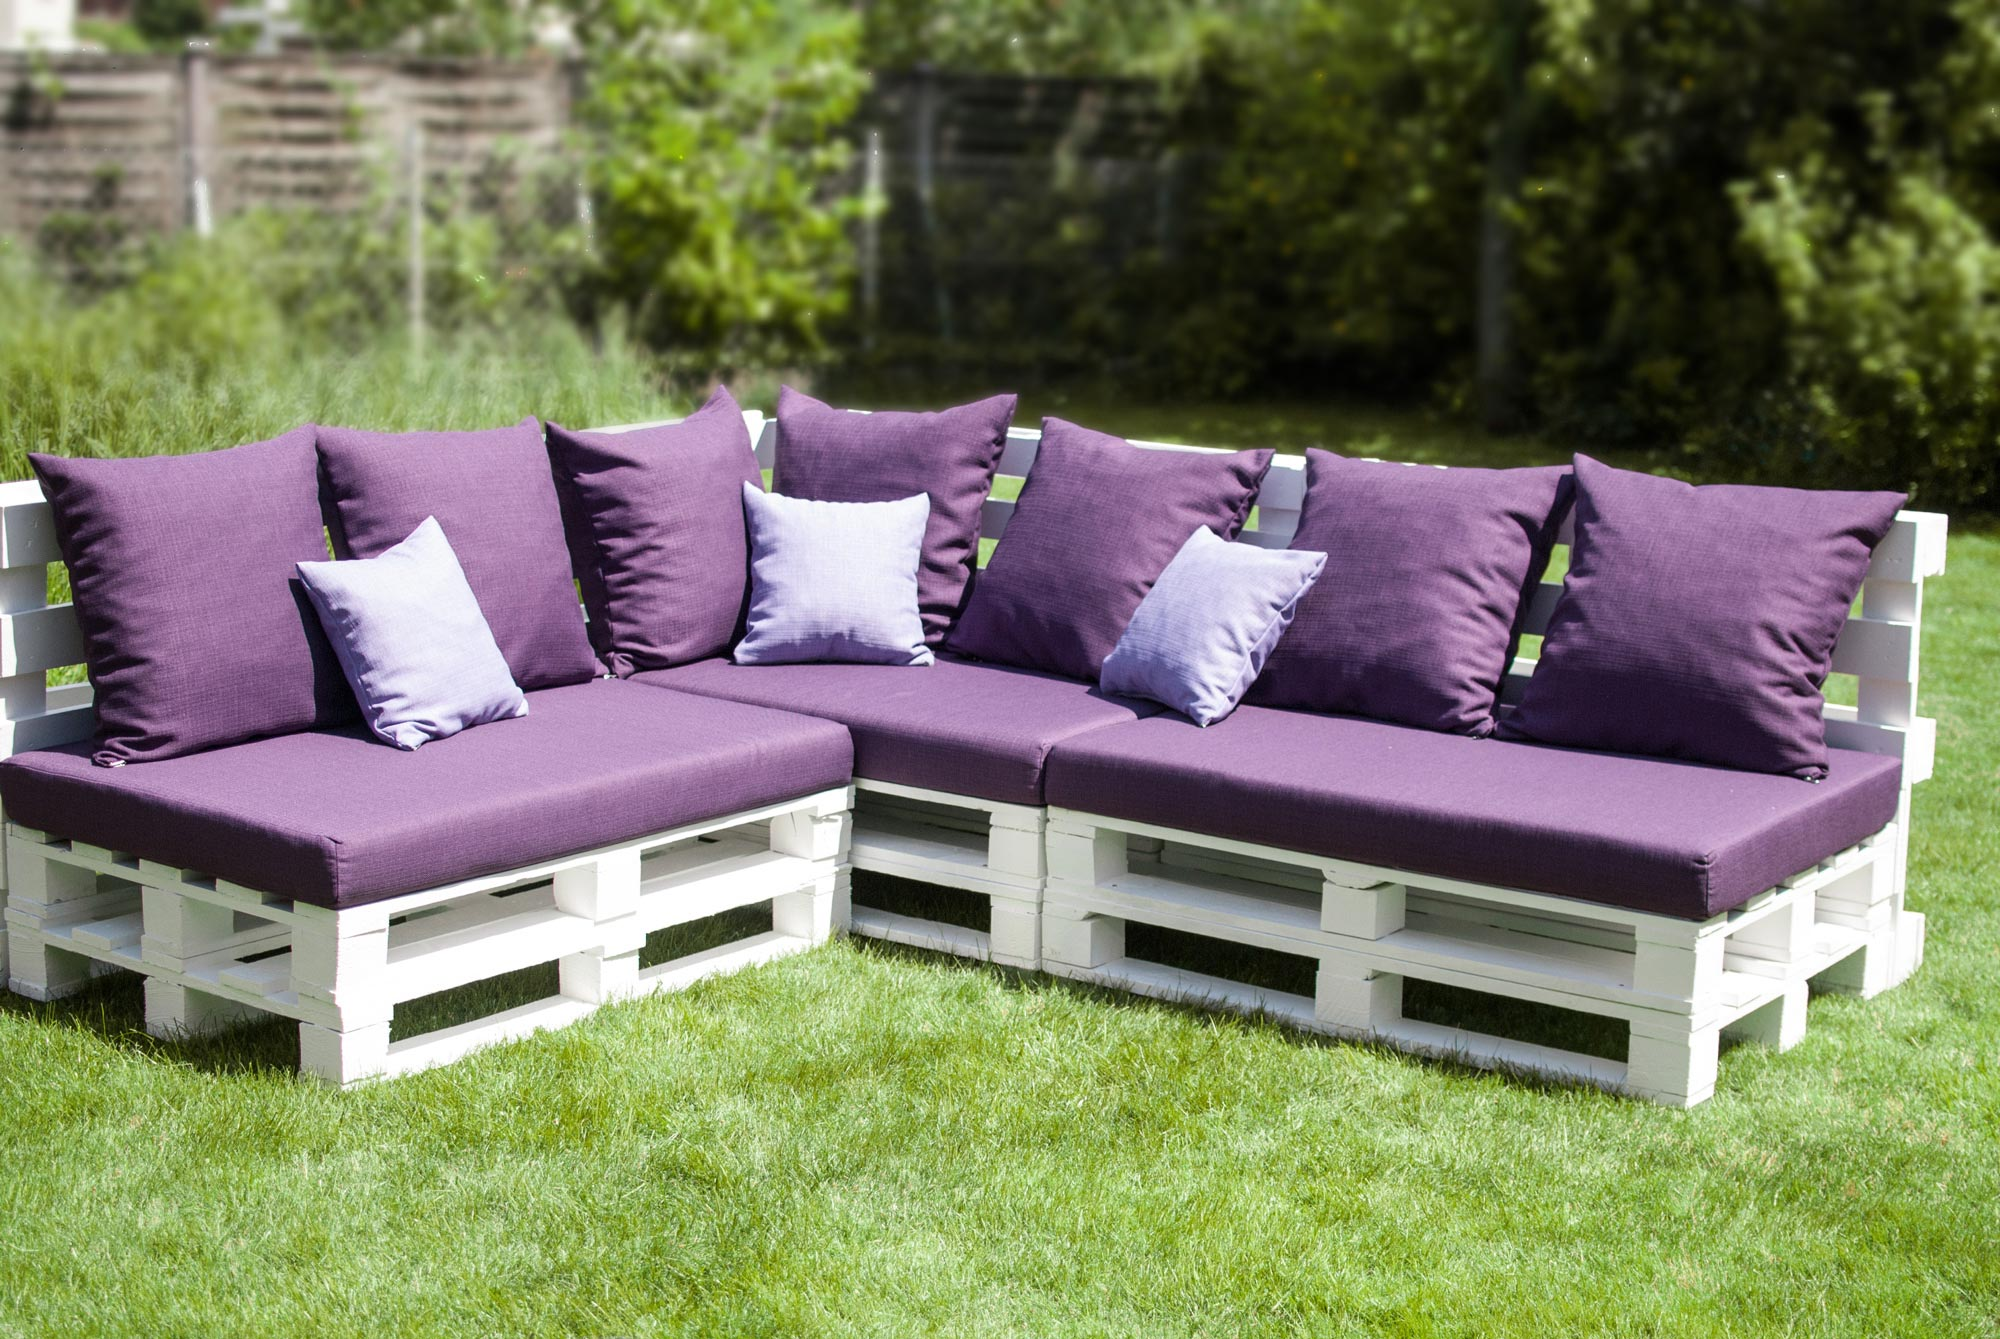 Diy sofa set untuk perabot santai di laman rumah anda